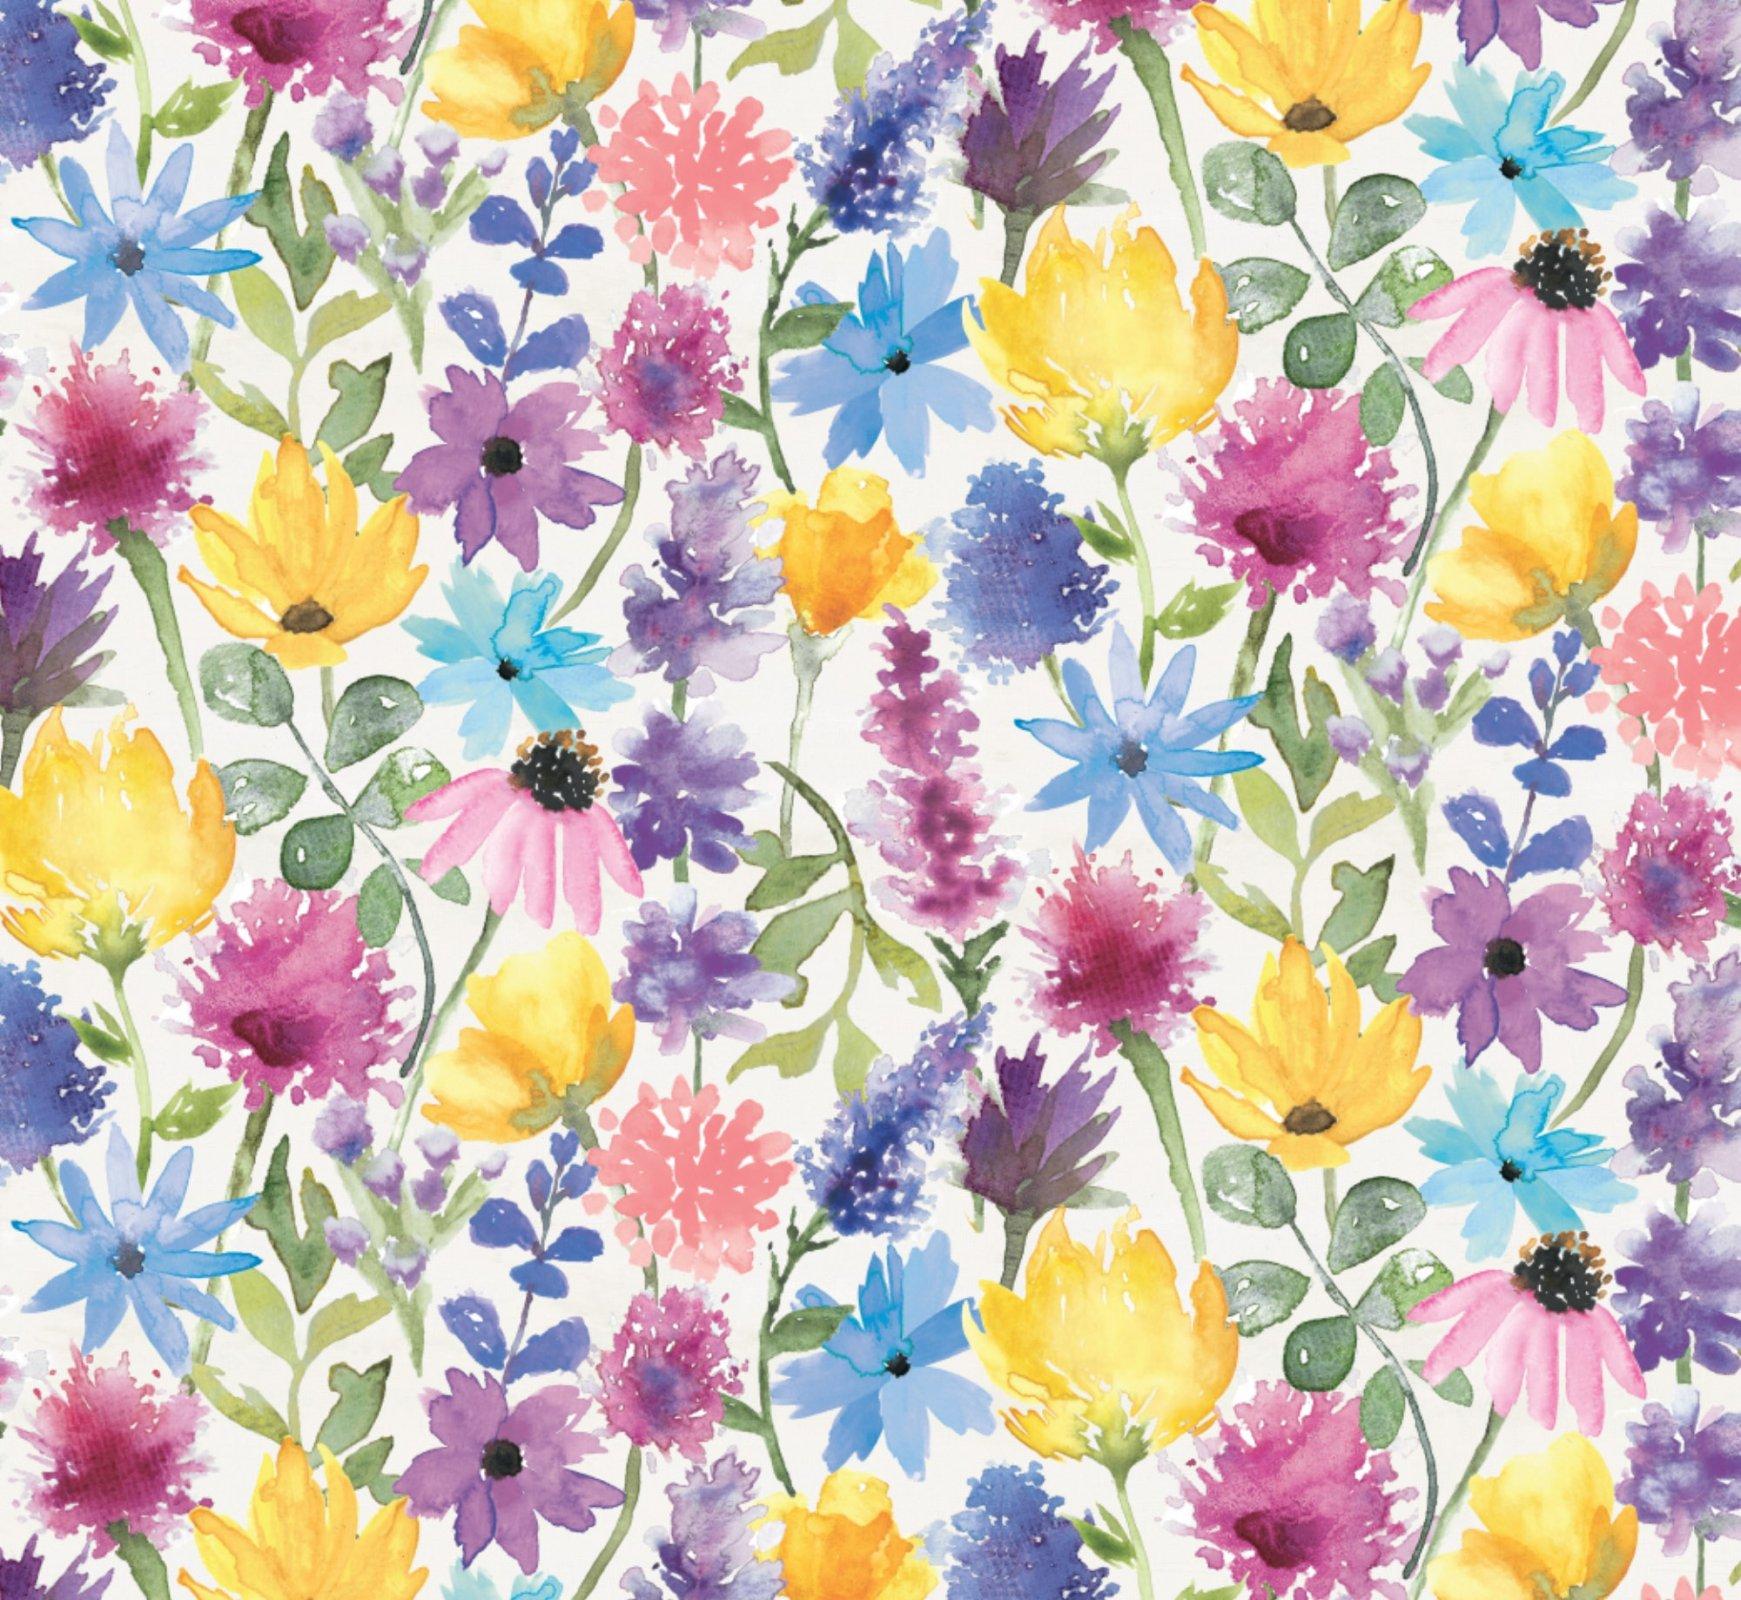 DT-Bee Harmony WA-5885-0C-1 White - Floral Harmony